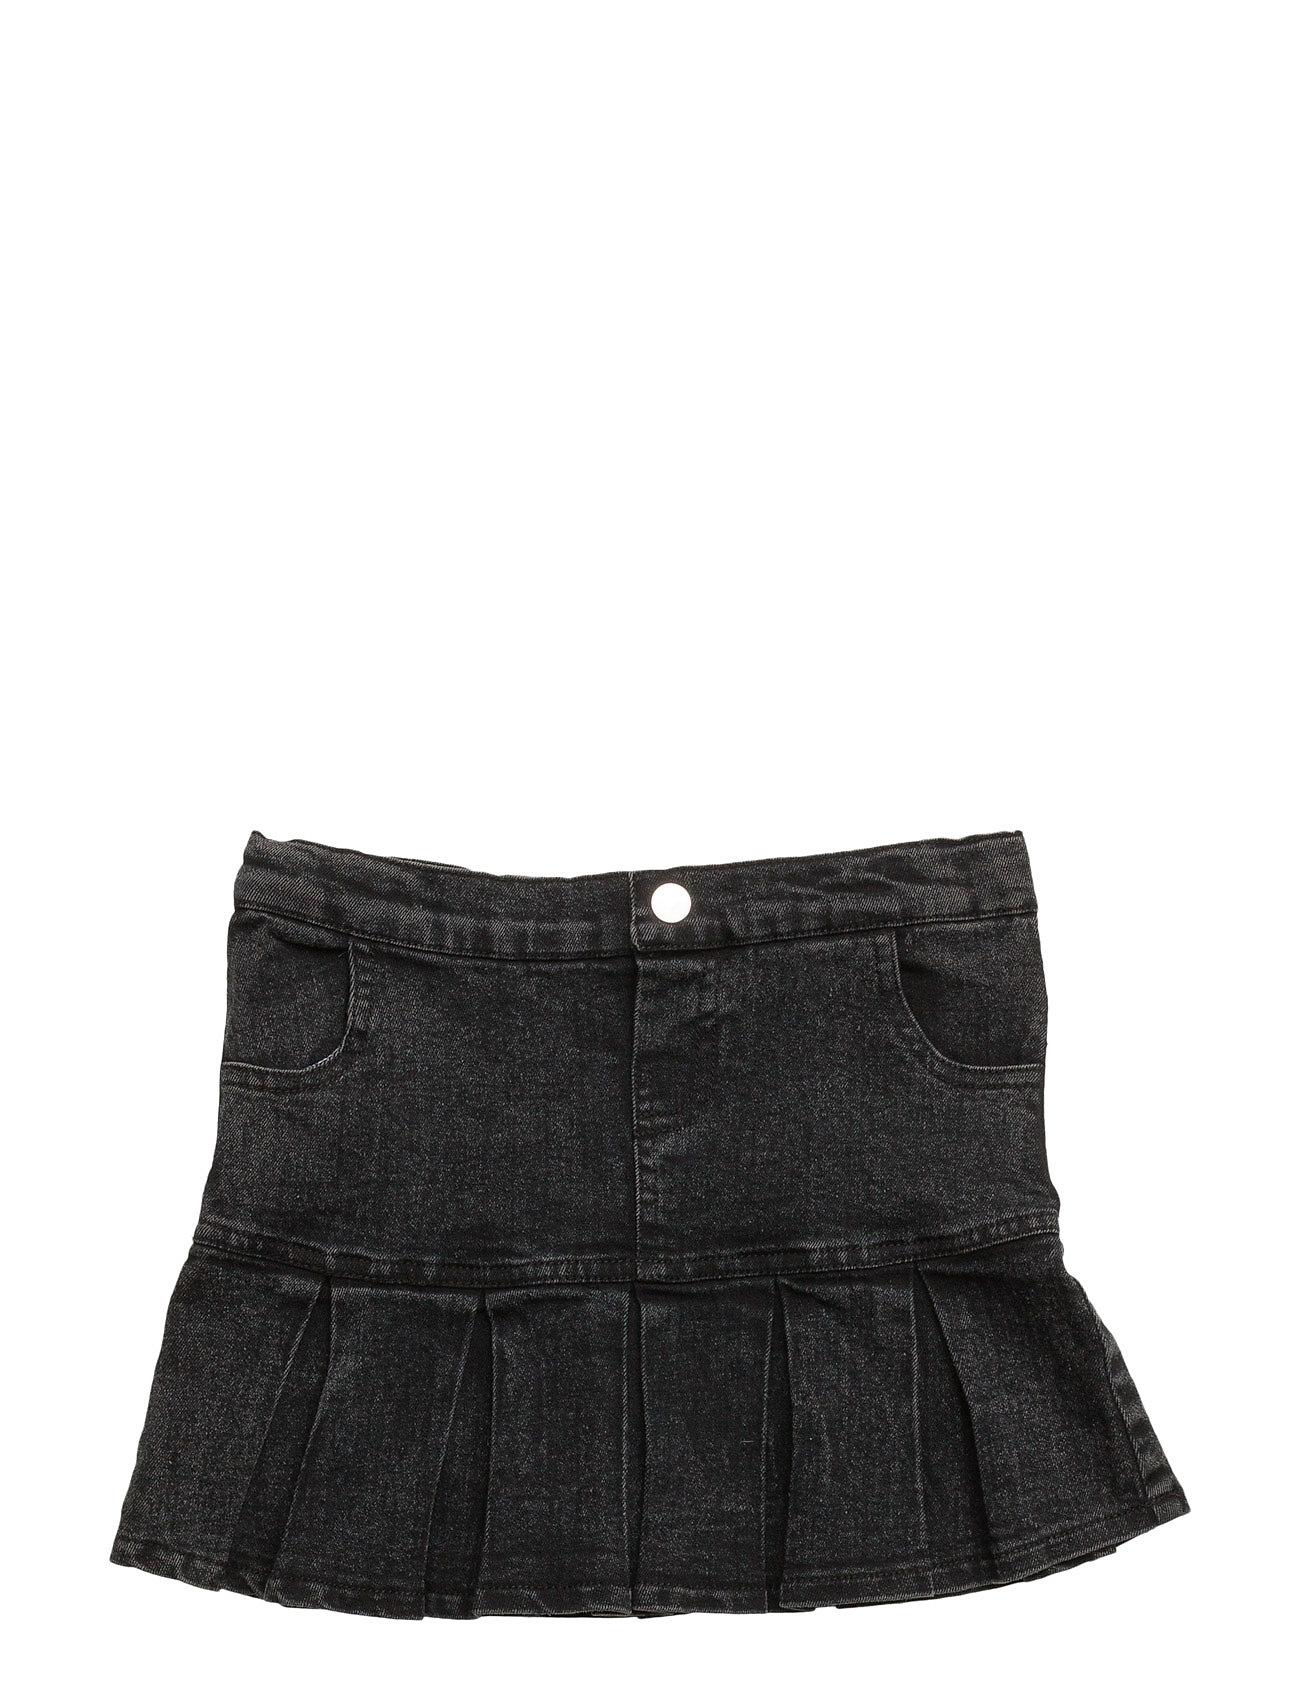 tao & friends – Denim skirt grey/black fra boozt.com dk